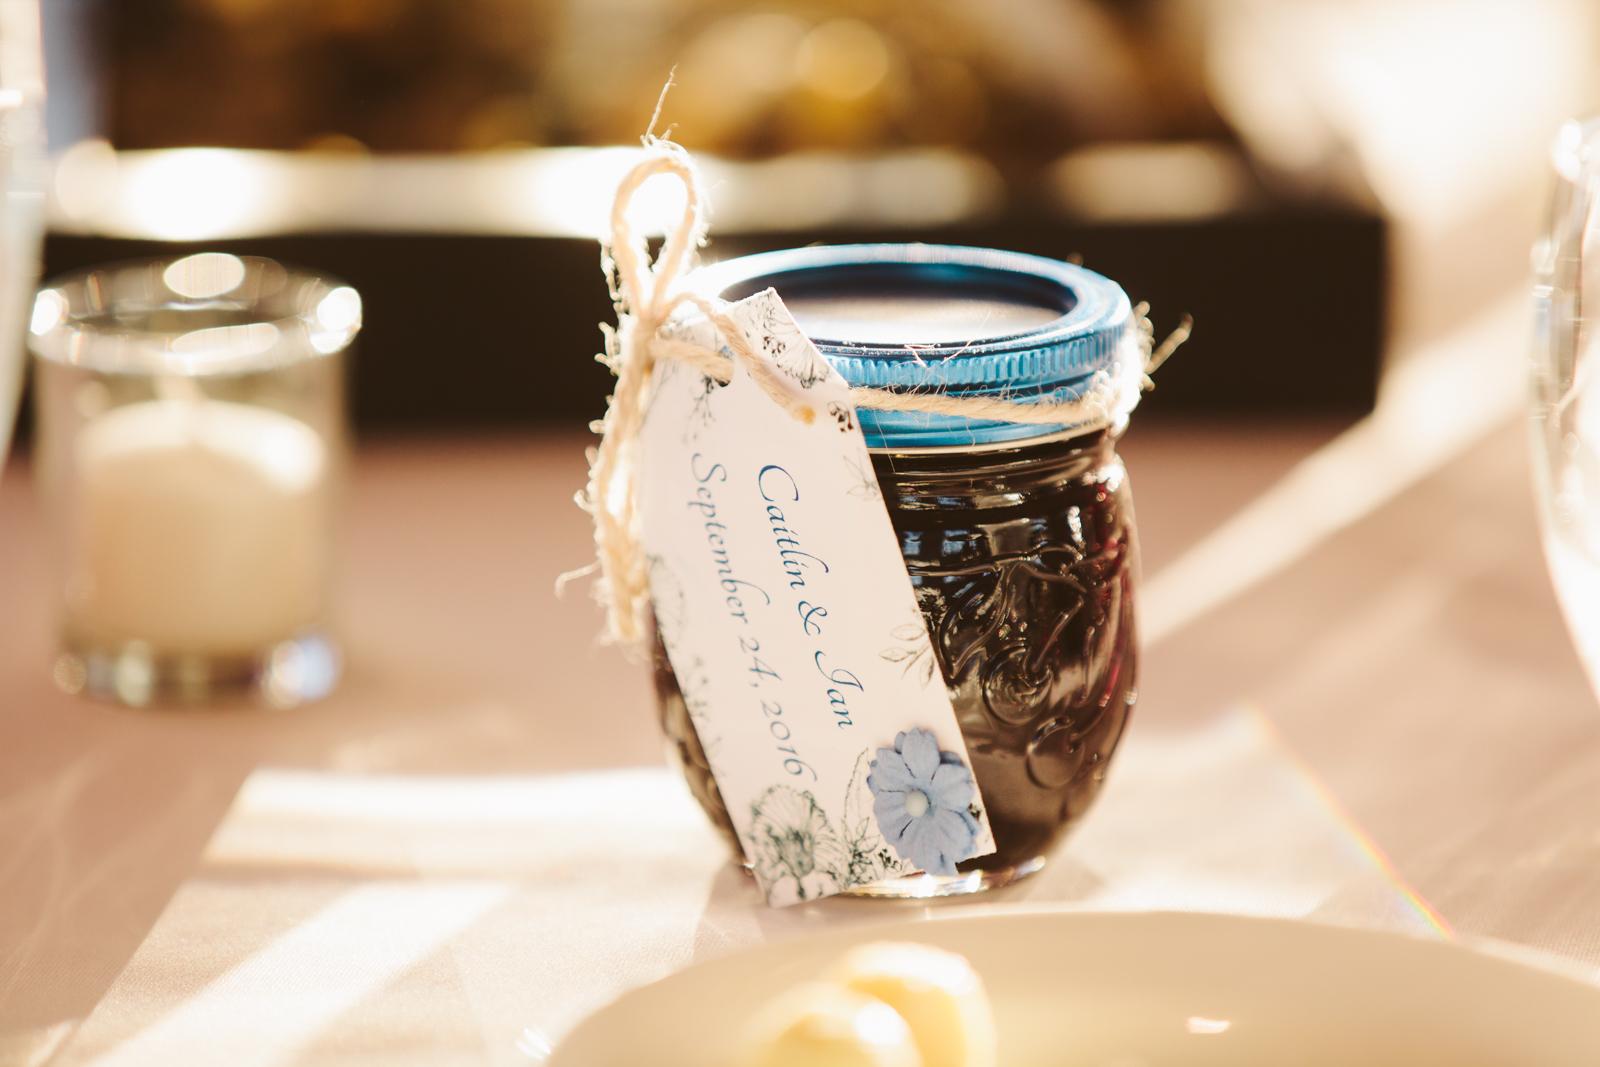 Eastons-Beach-Rotunda-Ballroom-Wedding-Newport-Rhode-Island-PhotographybyAmandaMorgan-96.jpg